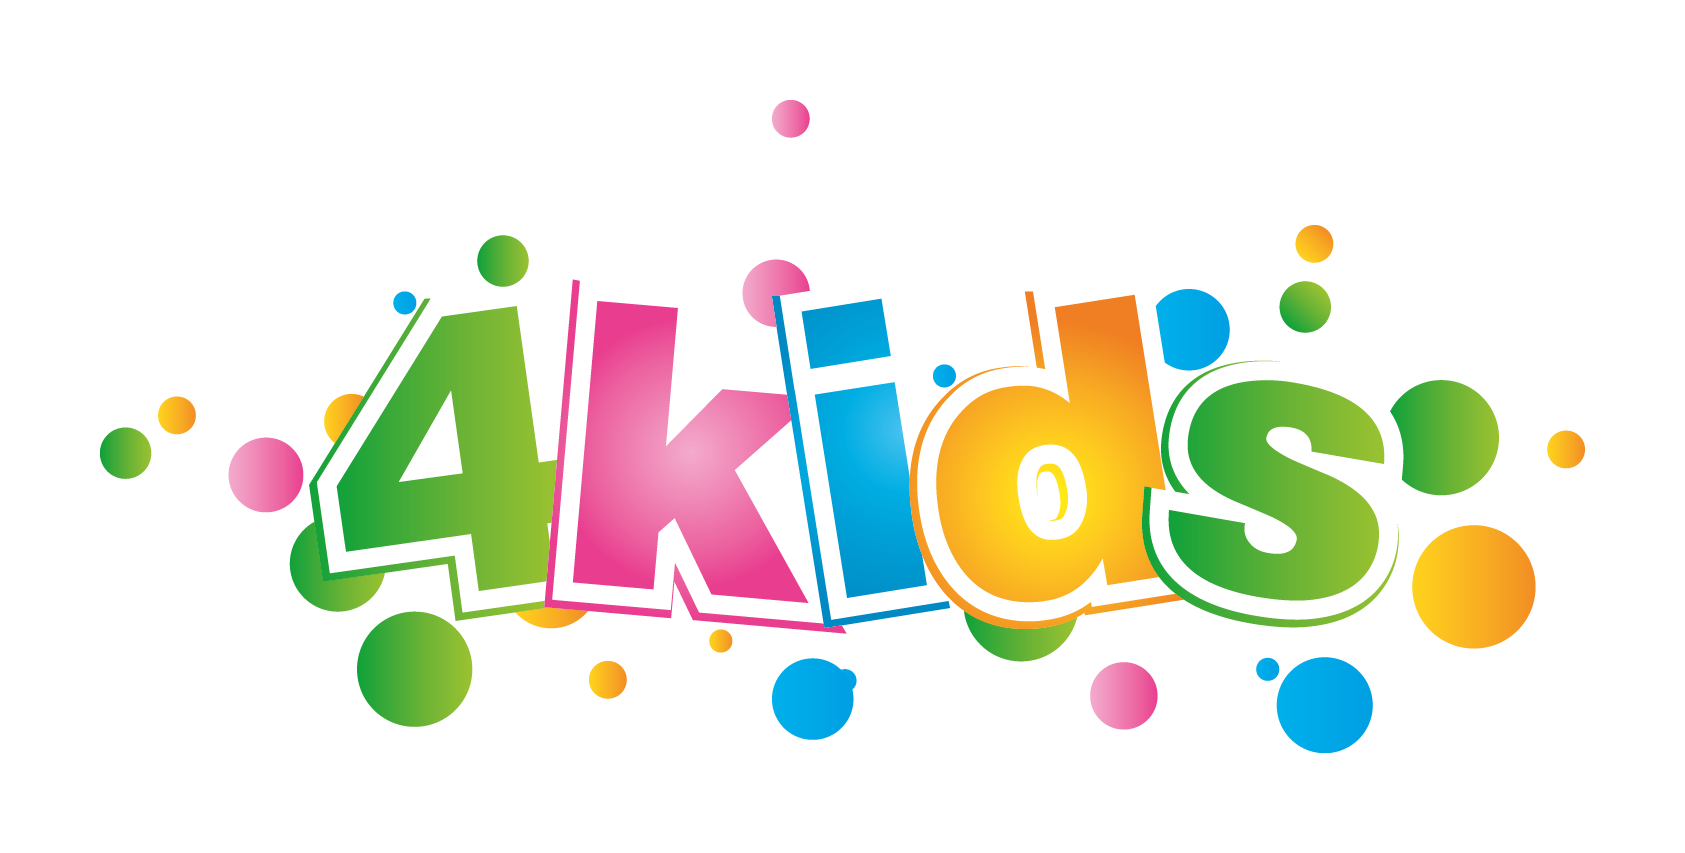 4Kids Logo Wallpaper